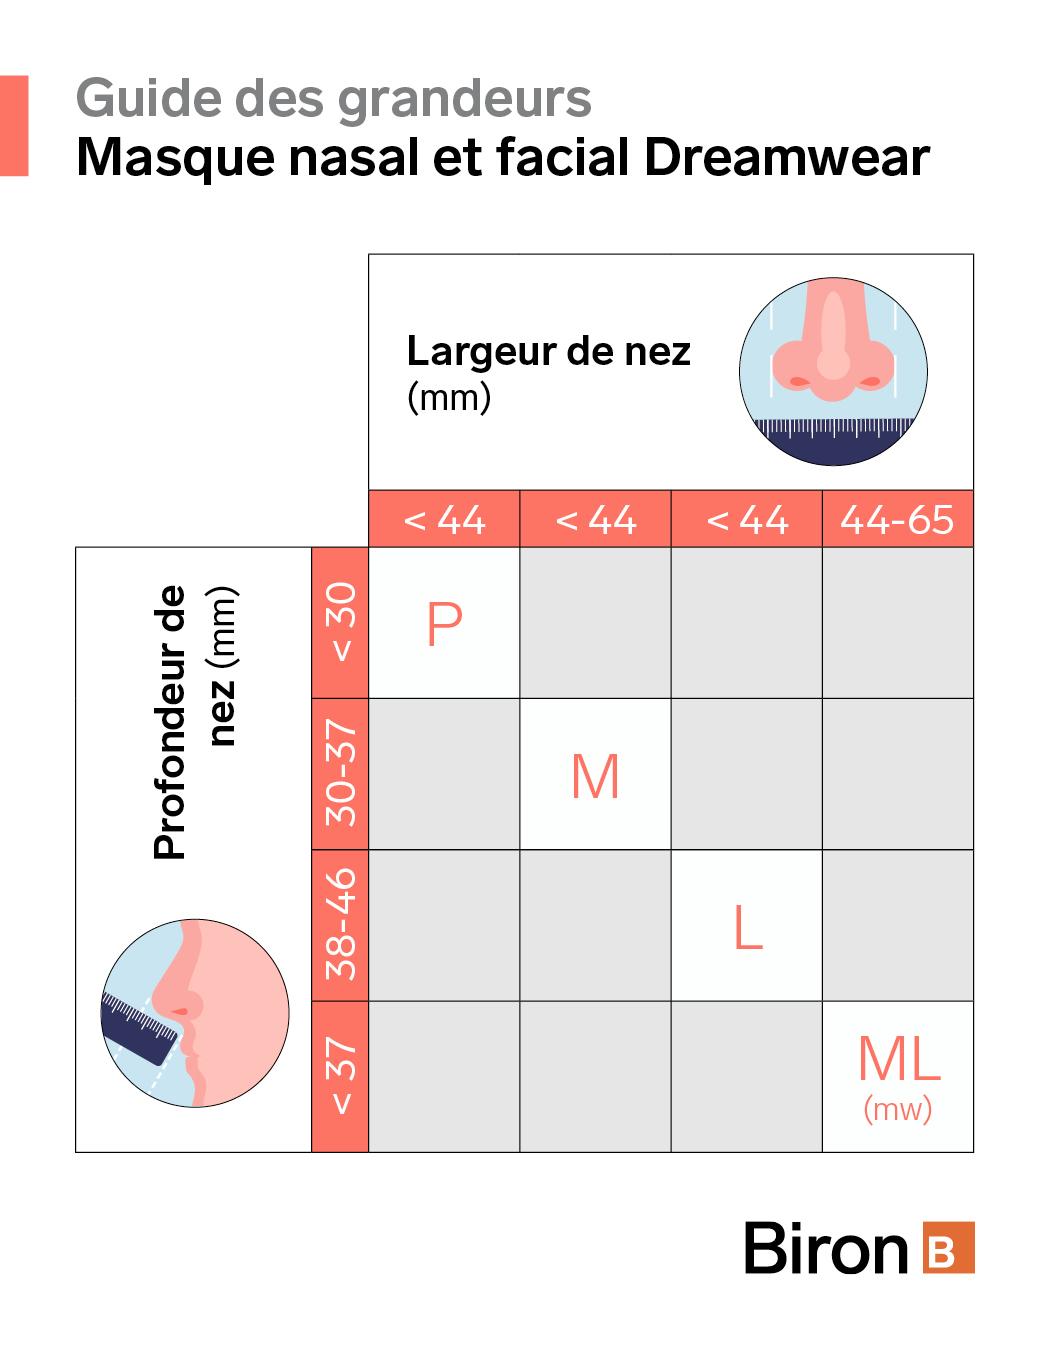 Gabarit grandeur Masque nasal et facial Dreamwear